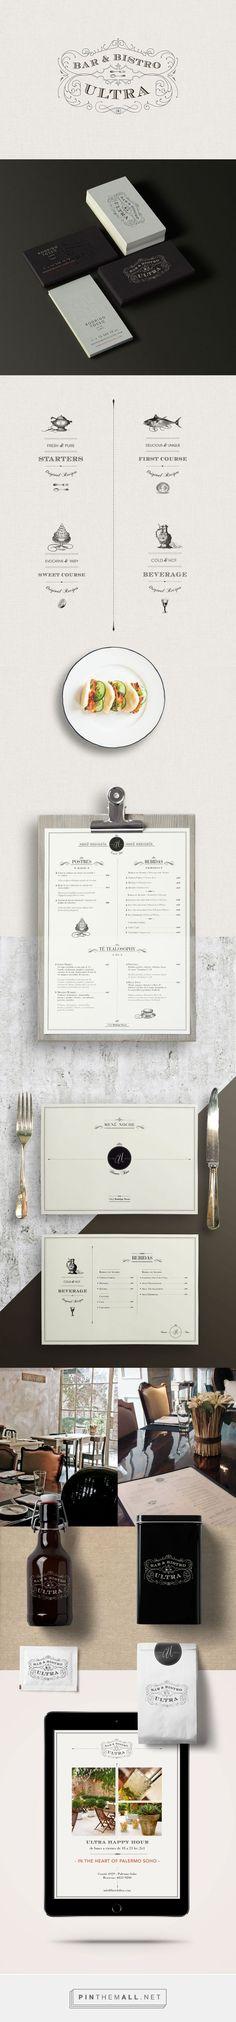 Ultra Bistro Restaurant Branding and Menu Design by Bunker3022   Fivestar Branding Agency – Design and Branding Agency & Inspiration Gallery